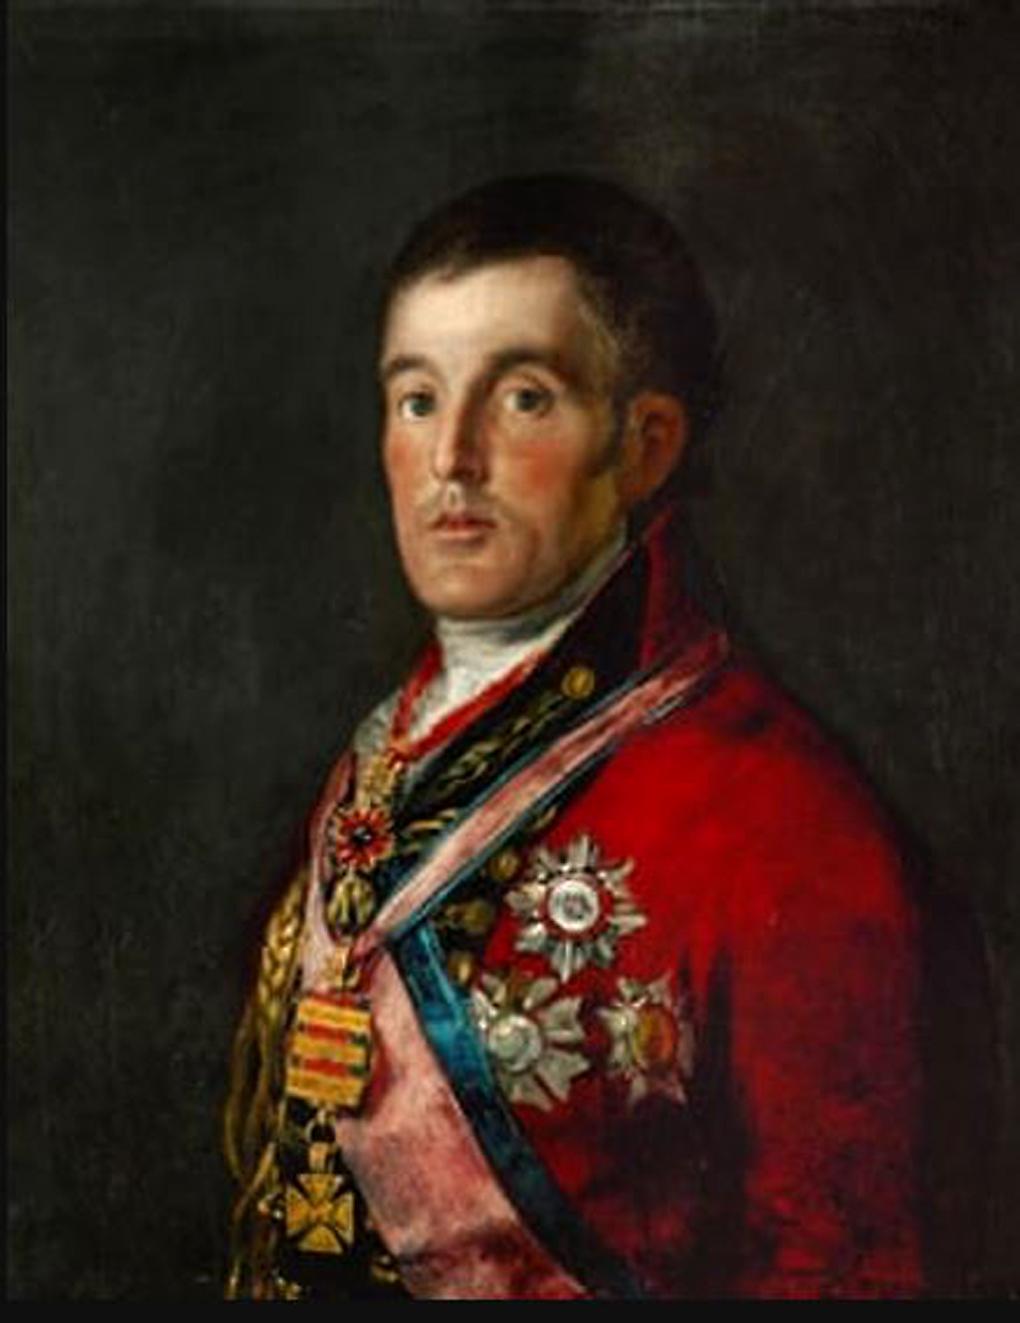 Goya's Duke of Wellington. Image Credit: Imagno/Getty Images, 2019.